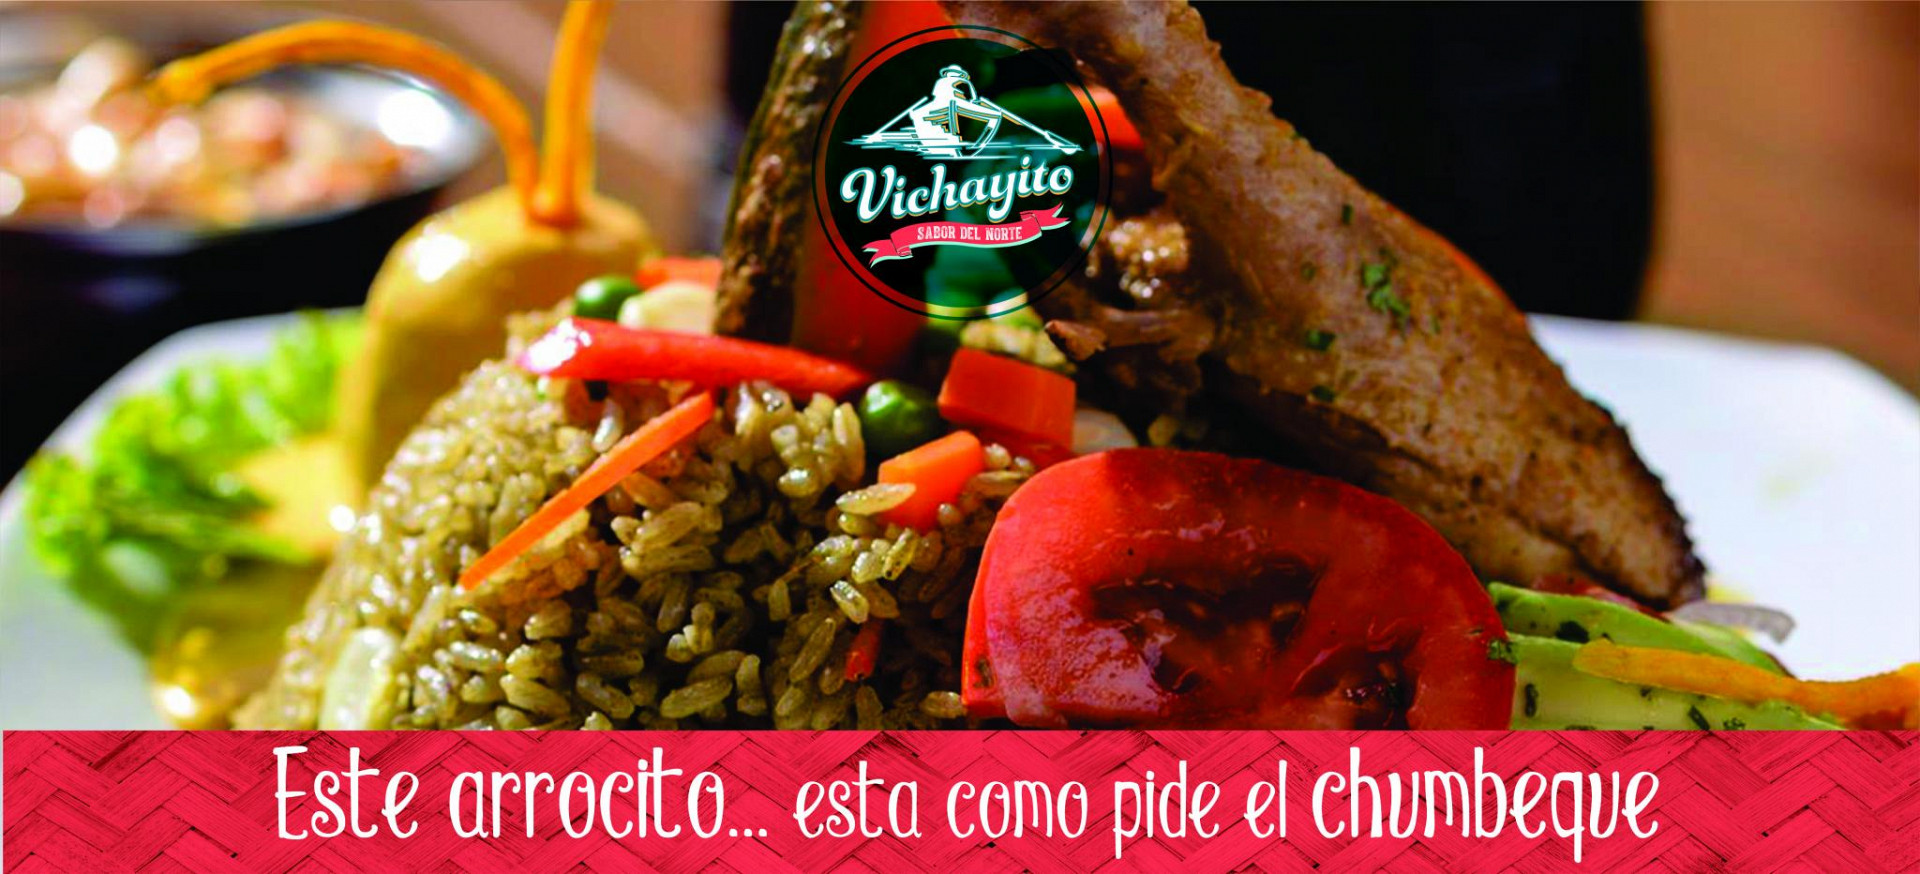 Foto de Cevichería Restaurant Vichayito S.R.L.